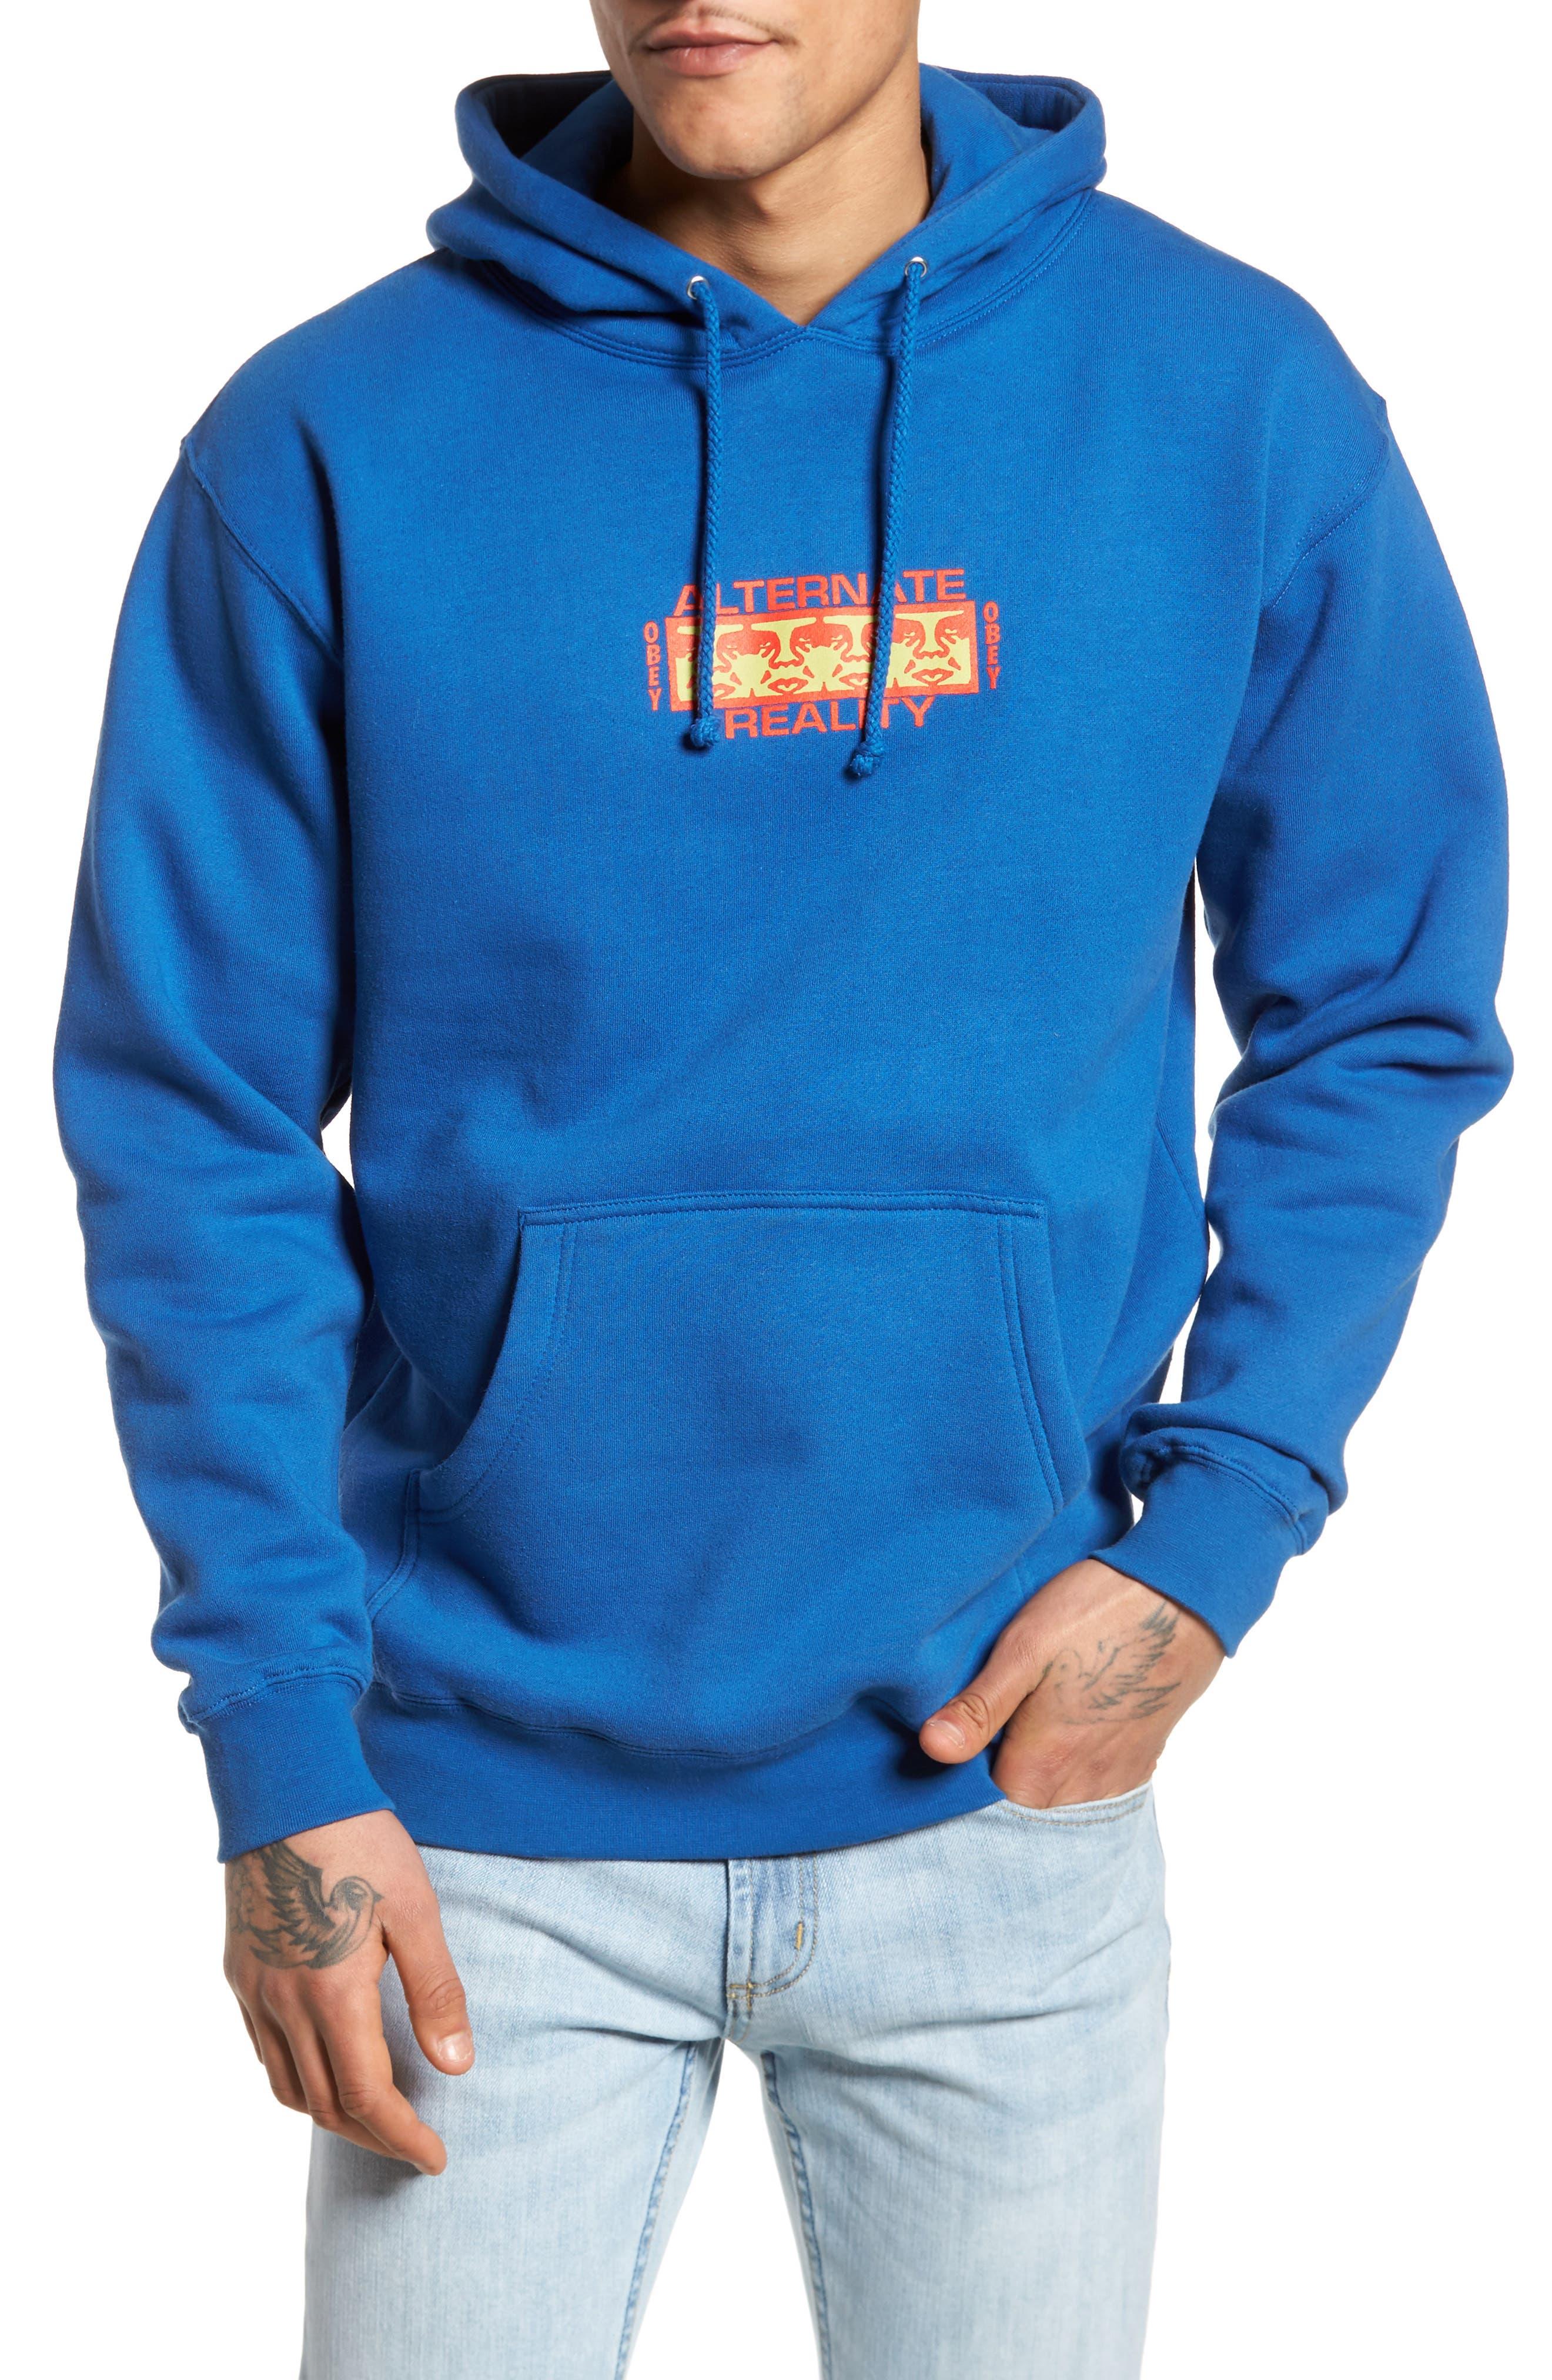 Alternate Reality Hoodie Sweatshirt,                             Main thumbnail 1, color,                             435